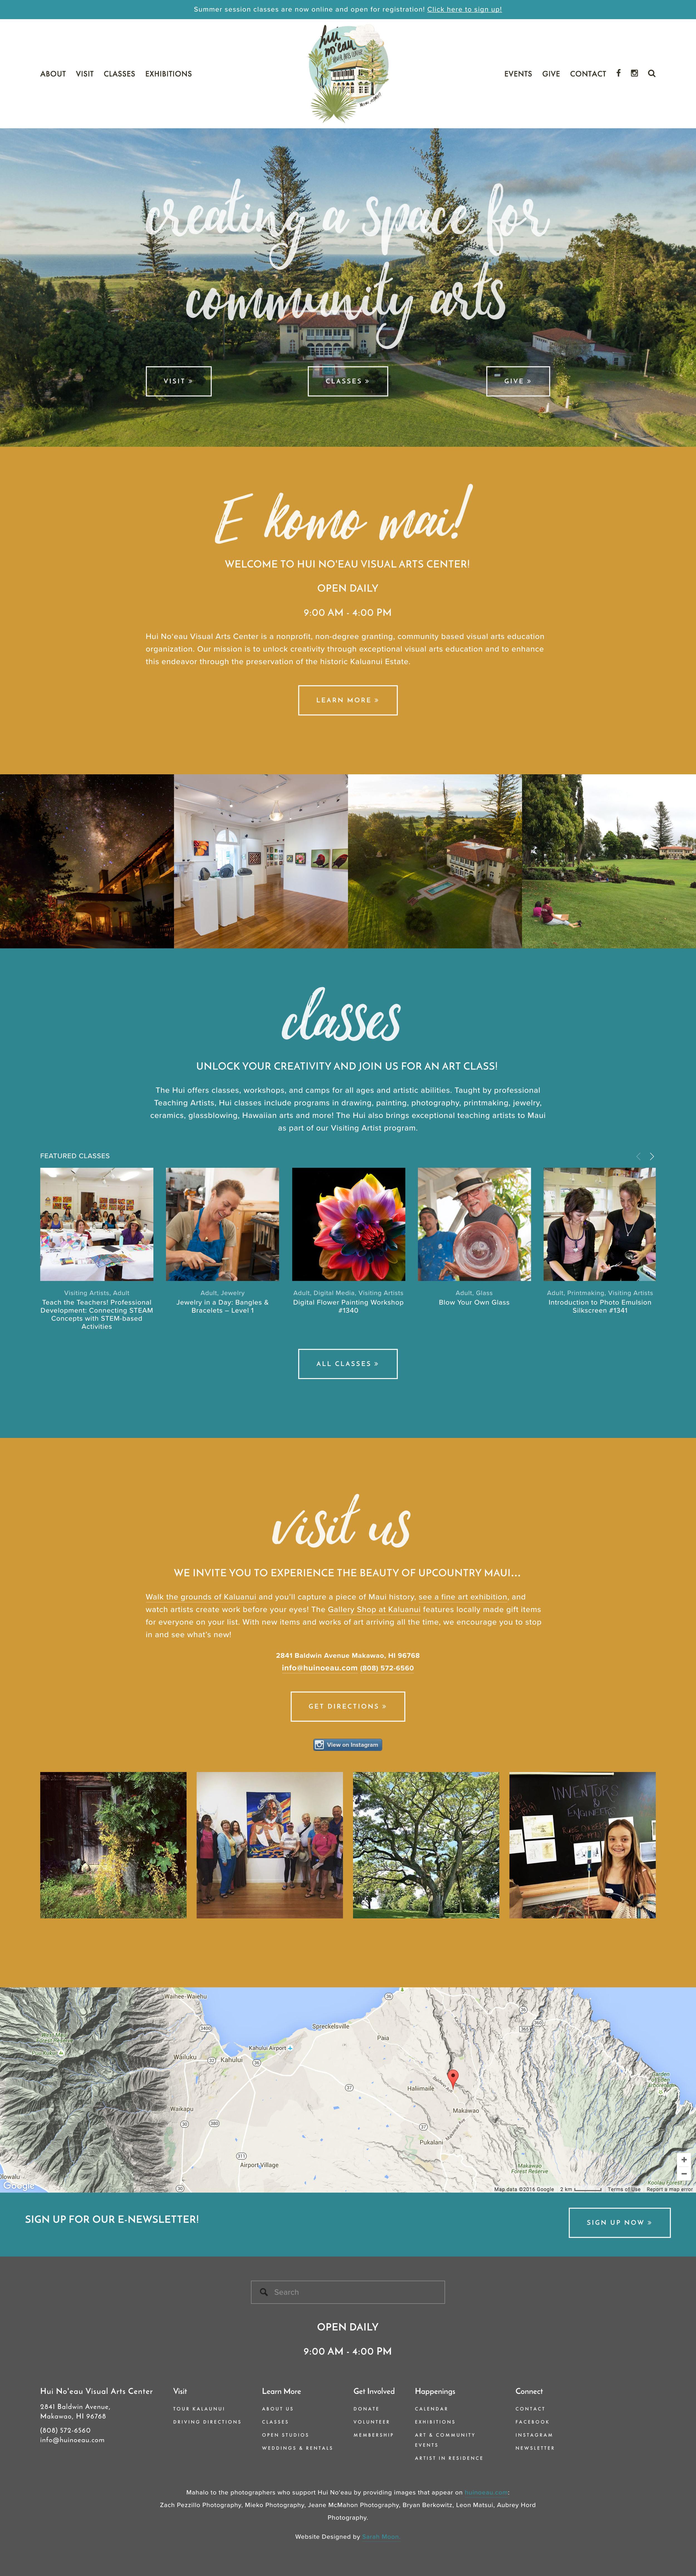 Final homepage for Hui No'eau Visual Arts Center | Design by Sarah Moon, sarahmoon.net